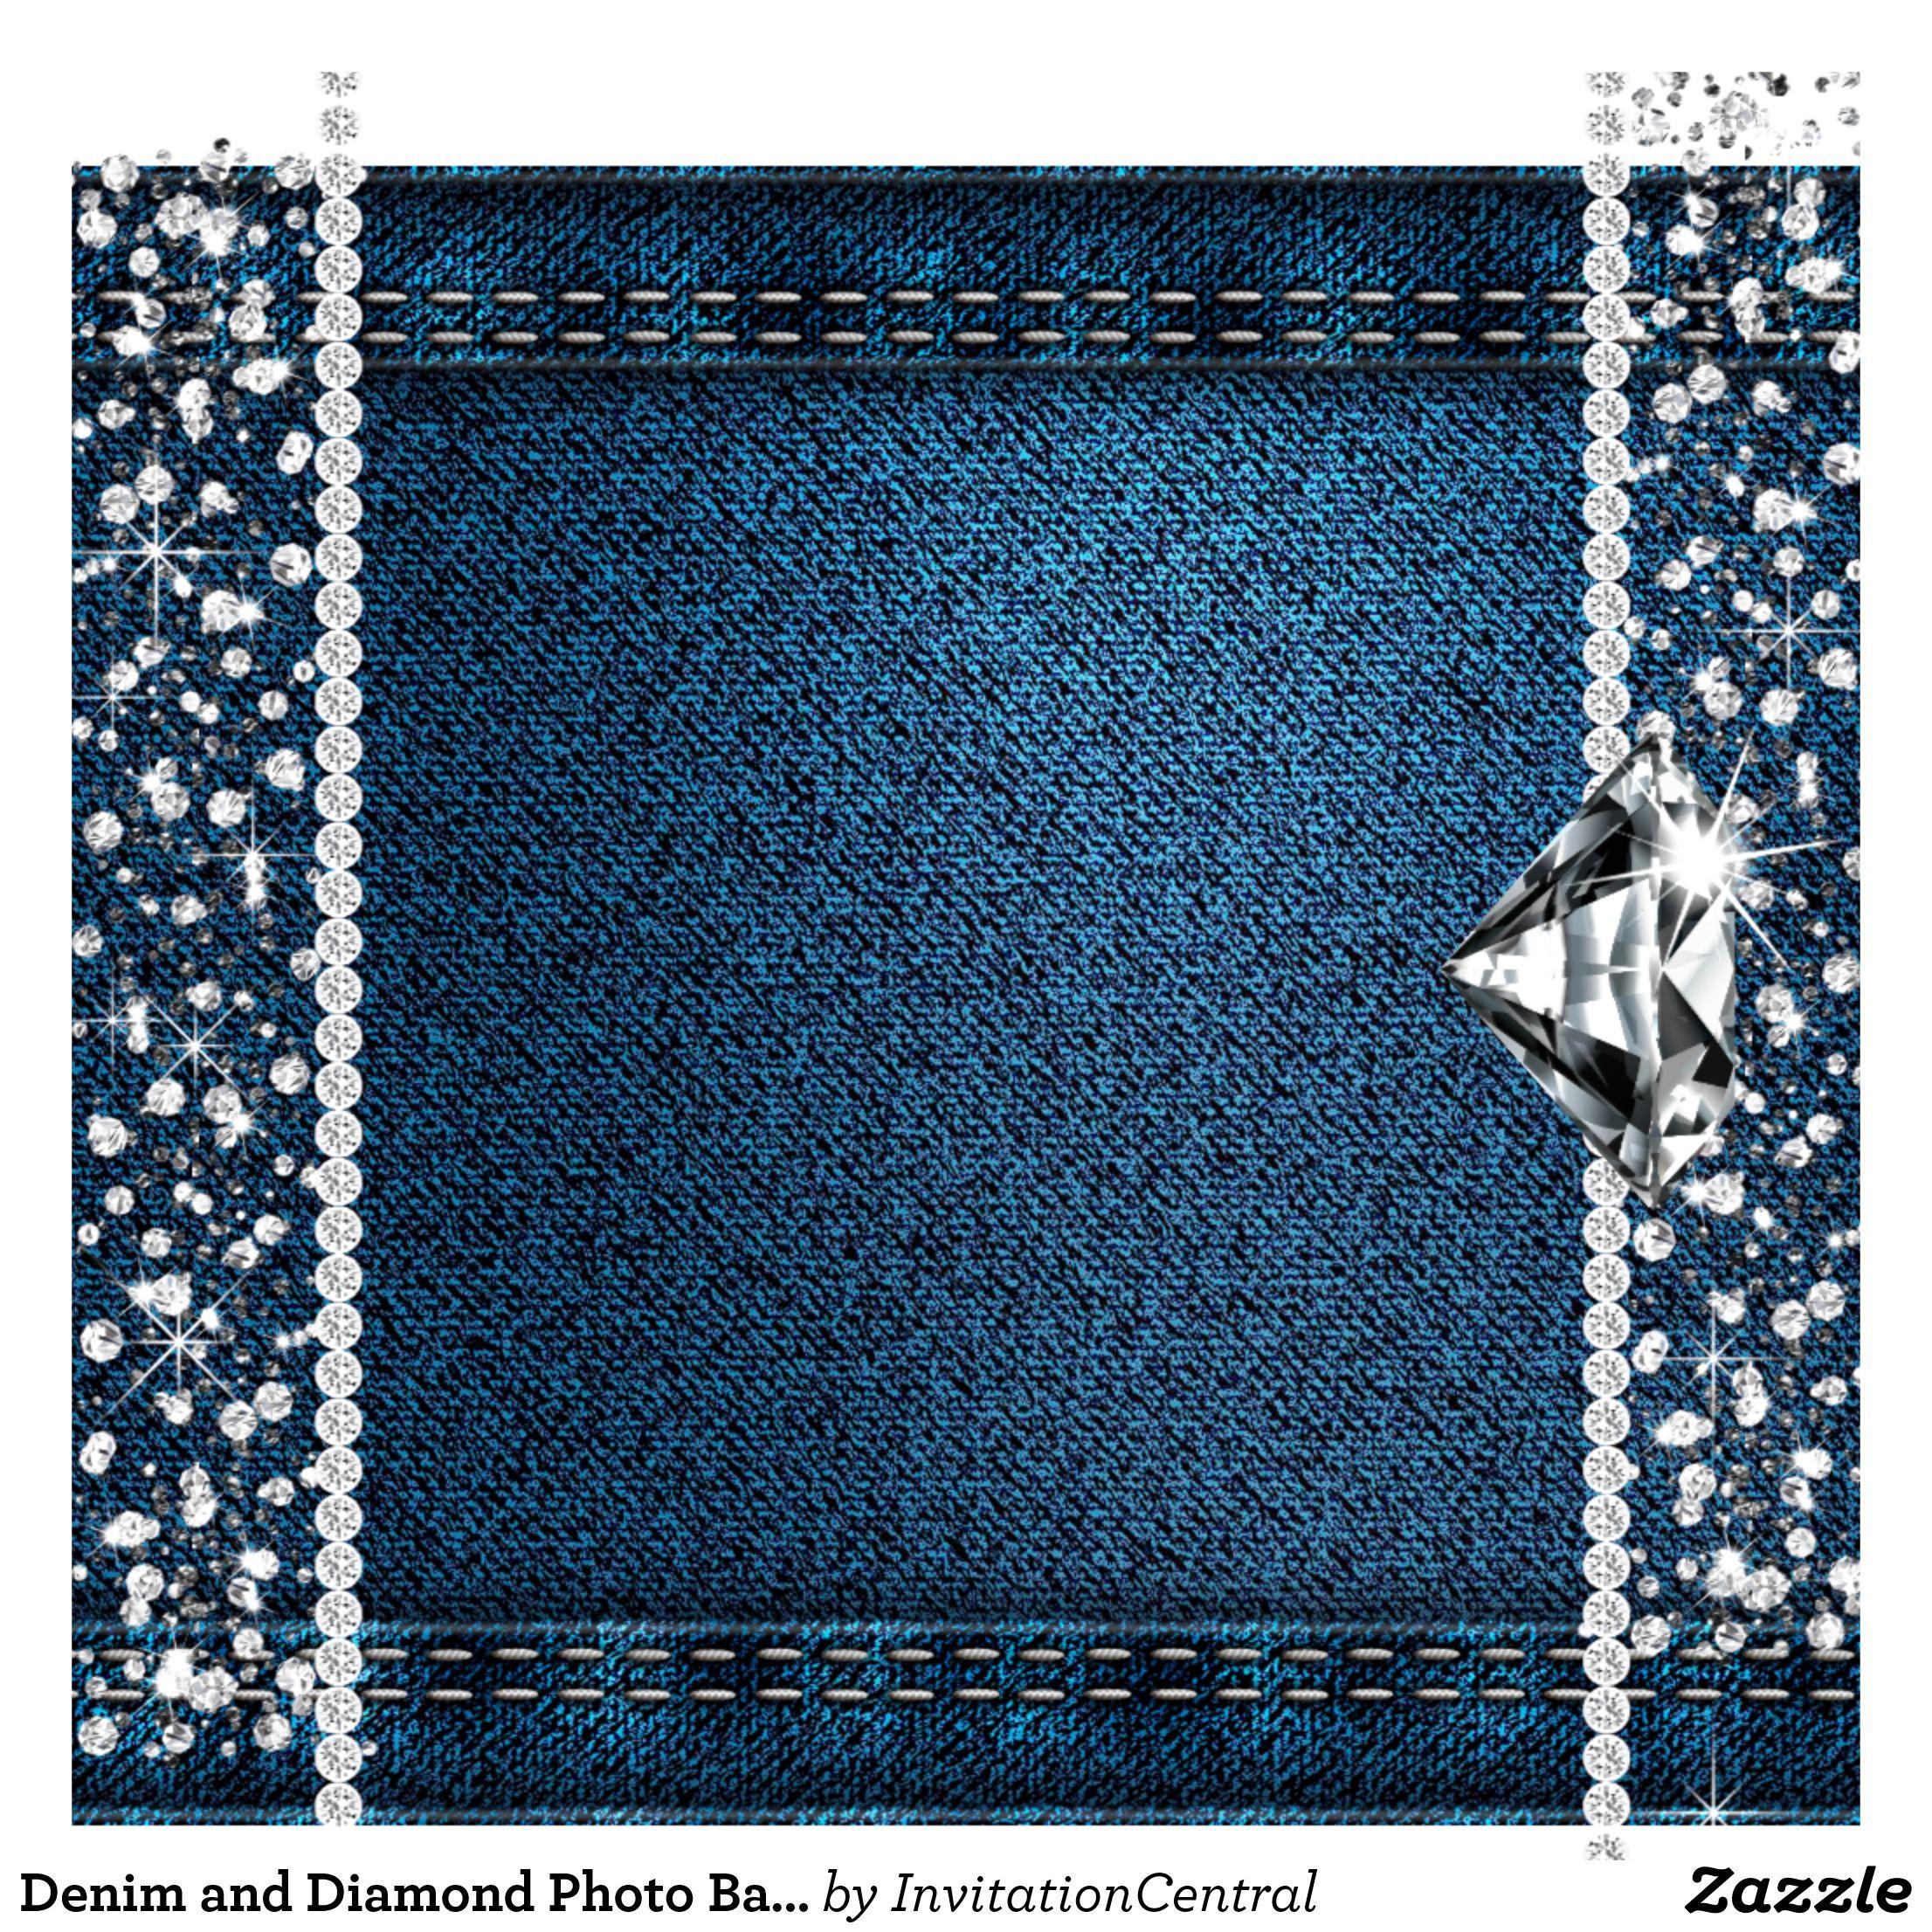 Denim And Diamond Photo Backdrop Photo Booth In 2021 Denim And Diamonds Diamonds And Denim Party Alcohol Bottle Crafts